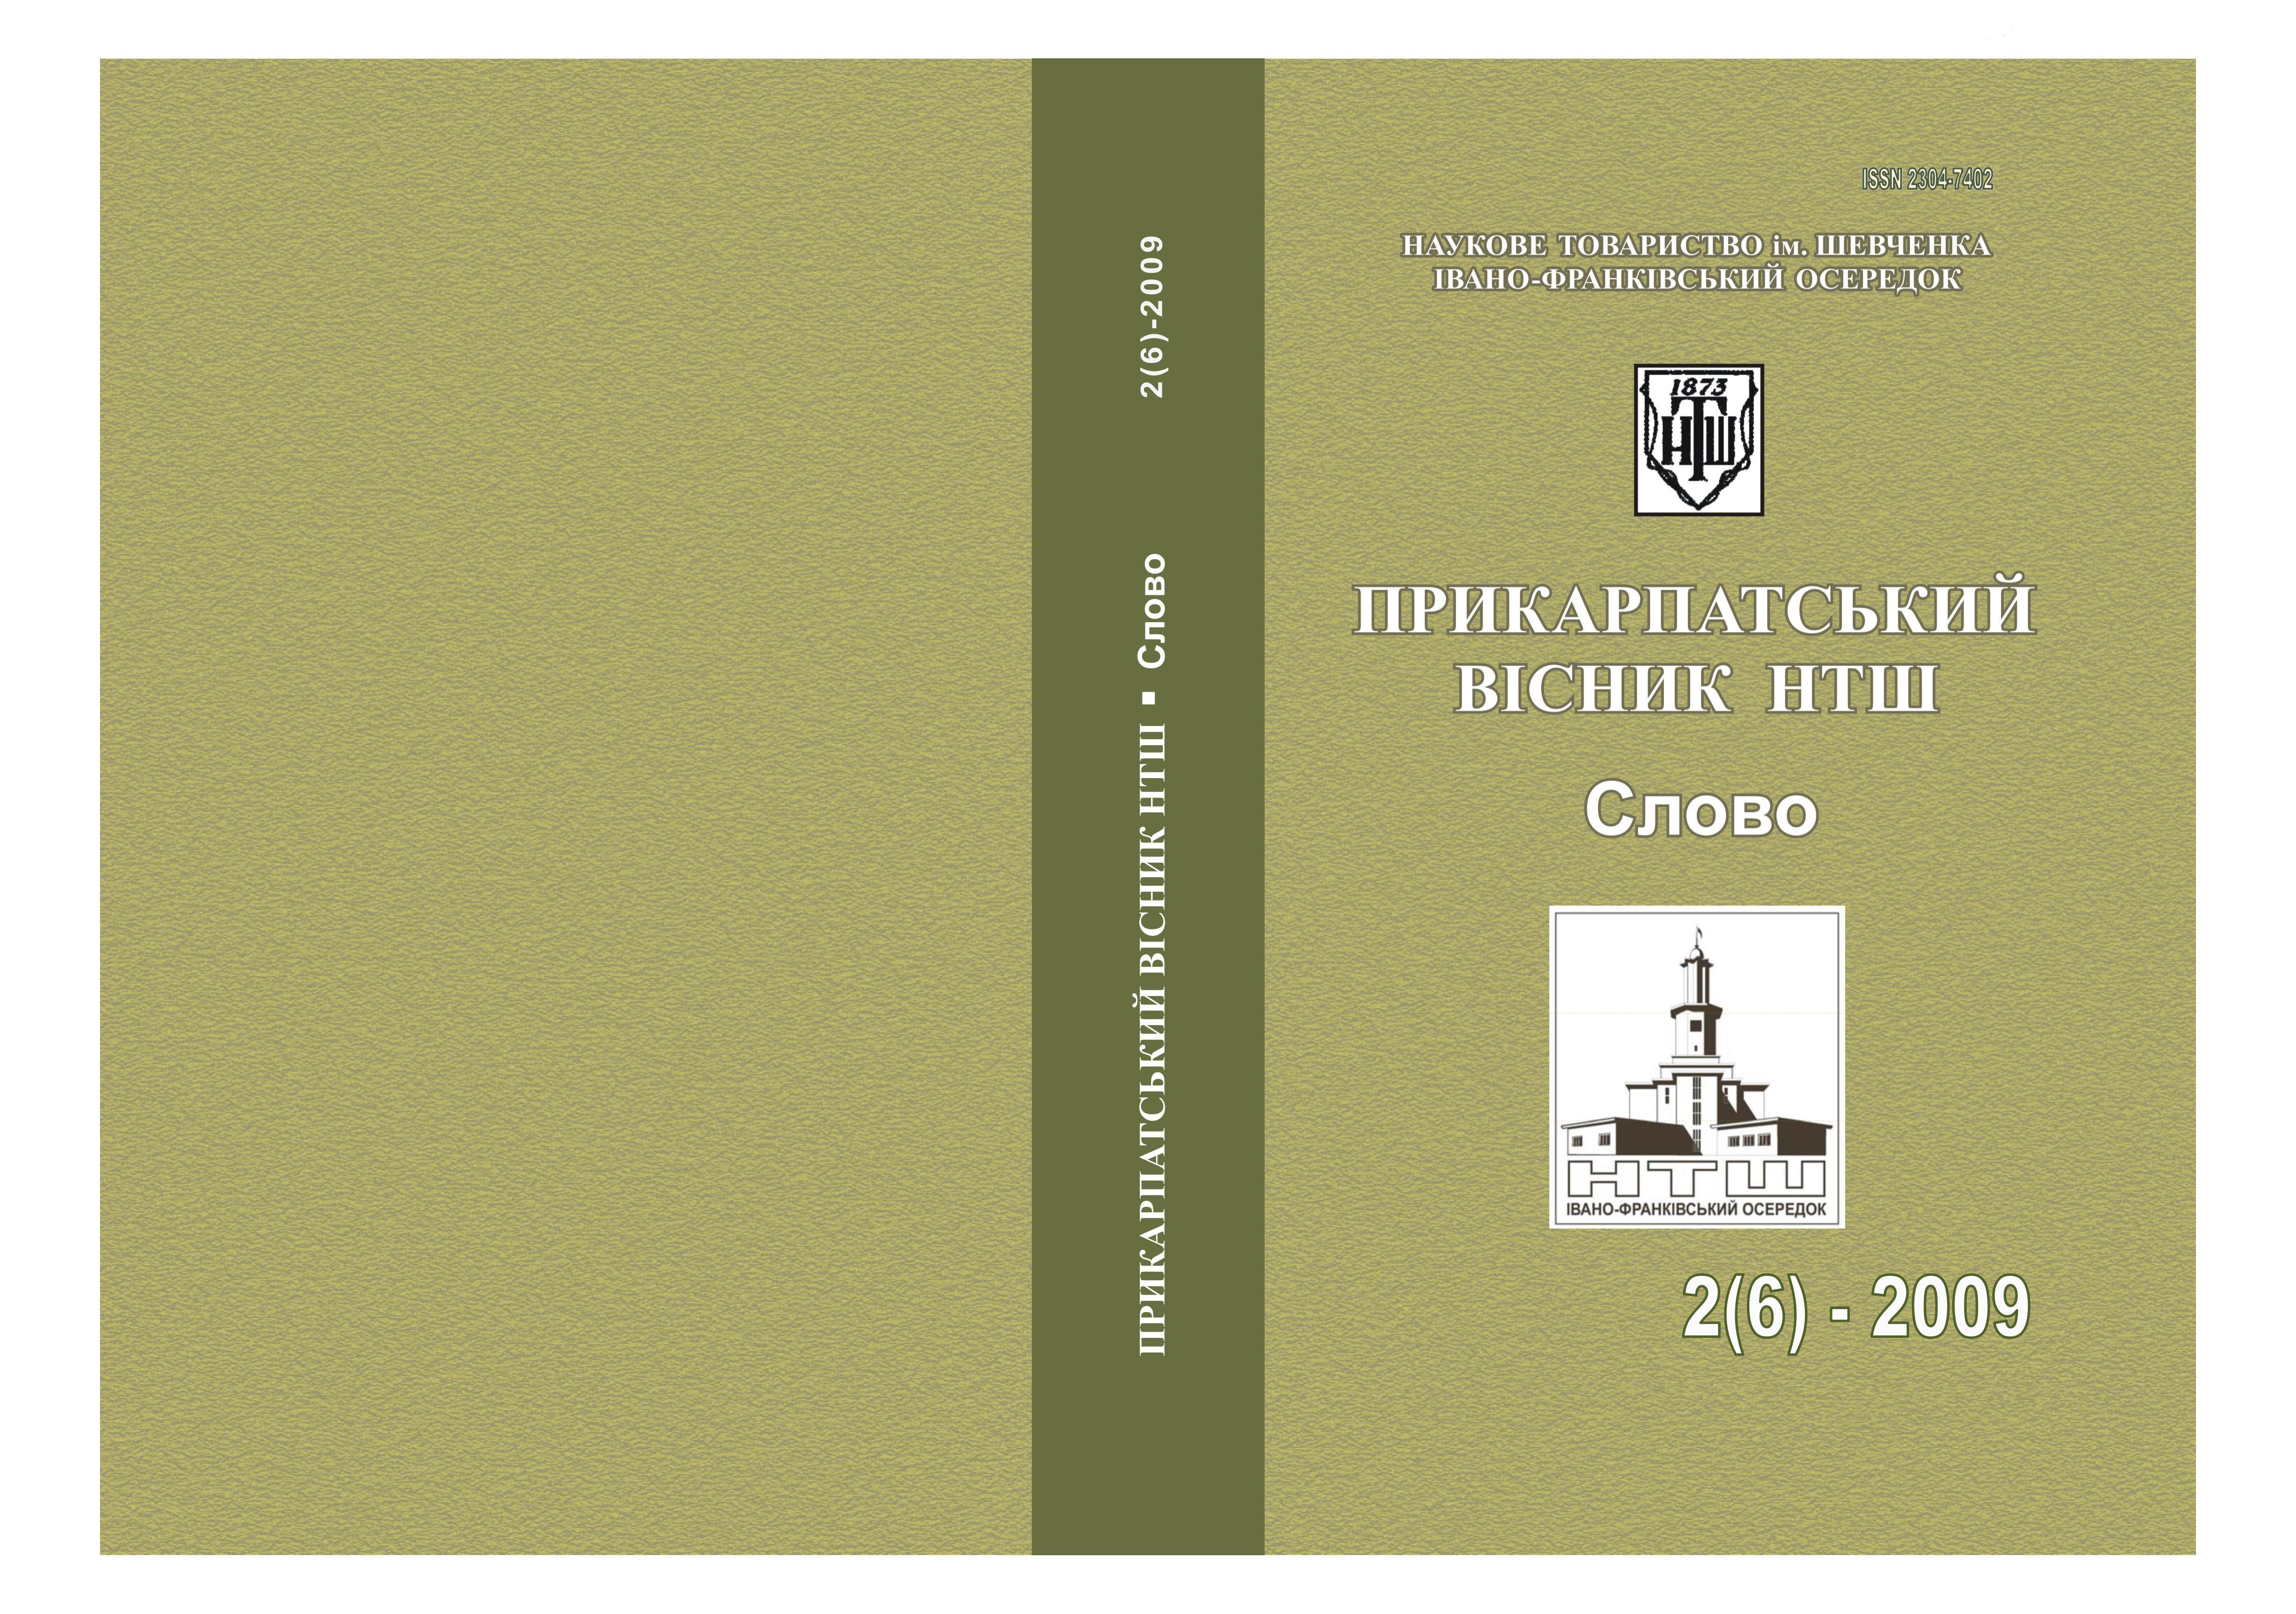 View No. 2(6) (2009): PRECARPATHIAN BULLETIN OF THE SHEVCHENKO SCIENTIFIC SOCIETY   Word